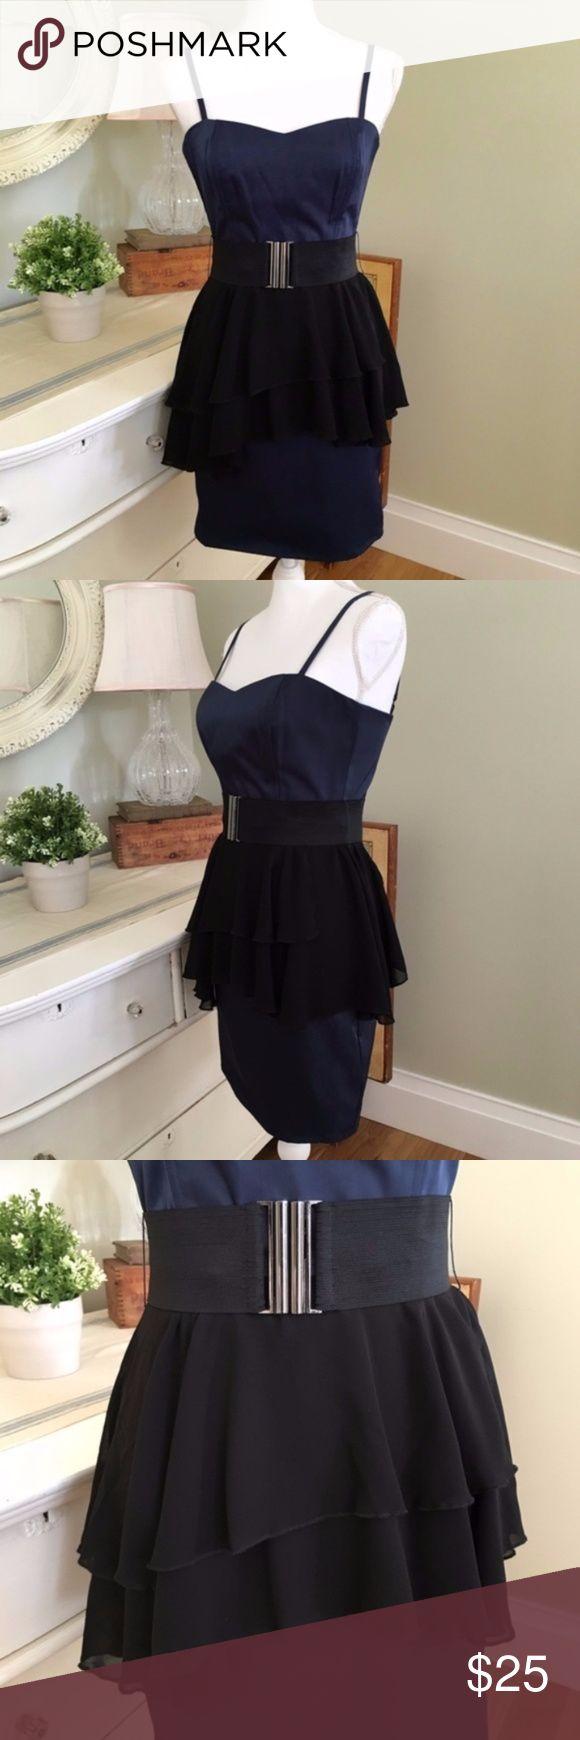 Blue dress size 6 nylon